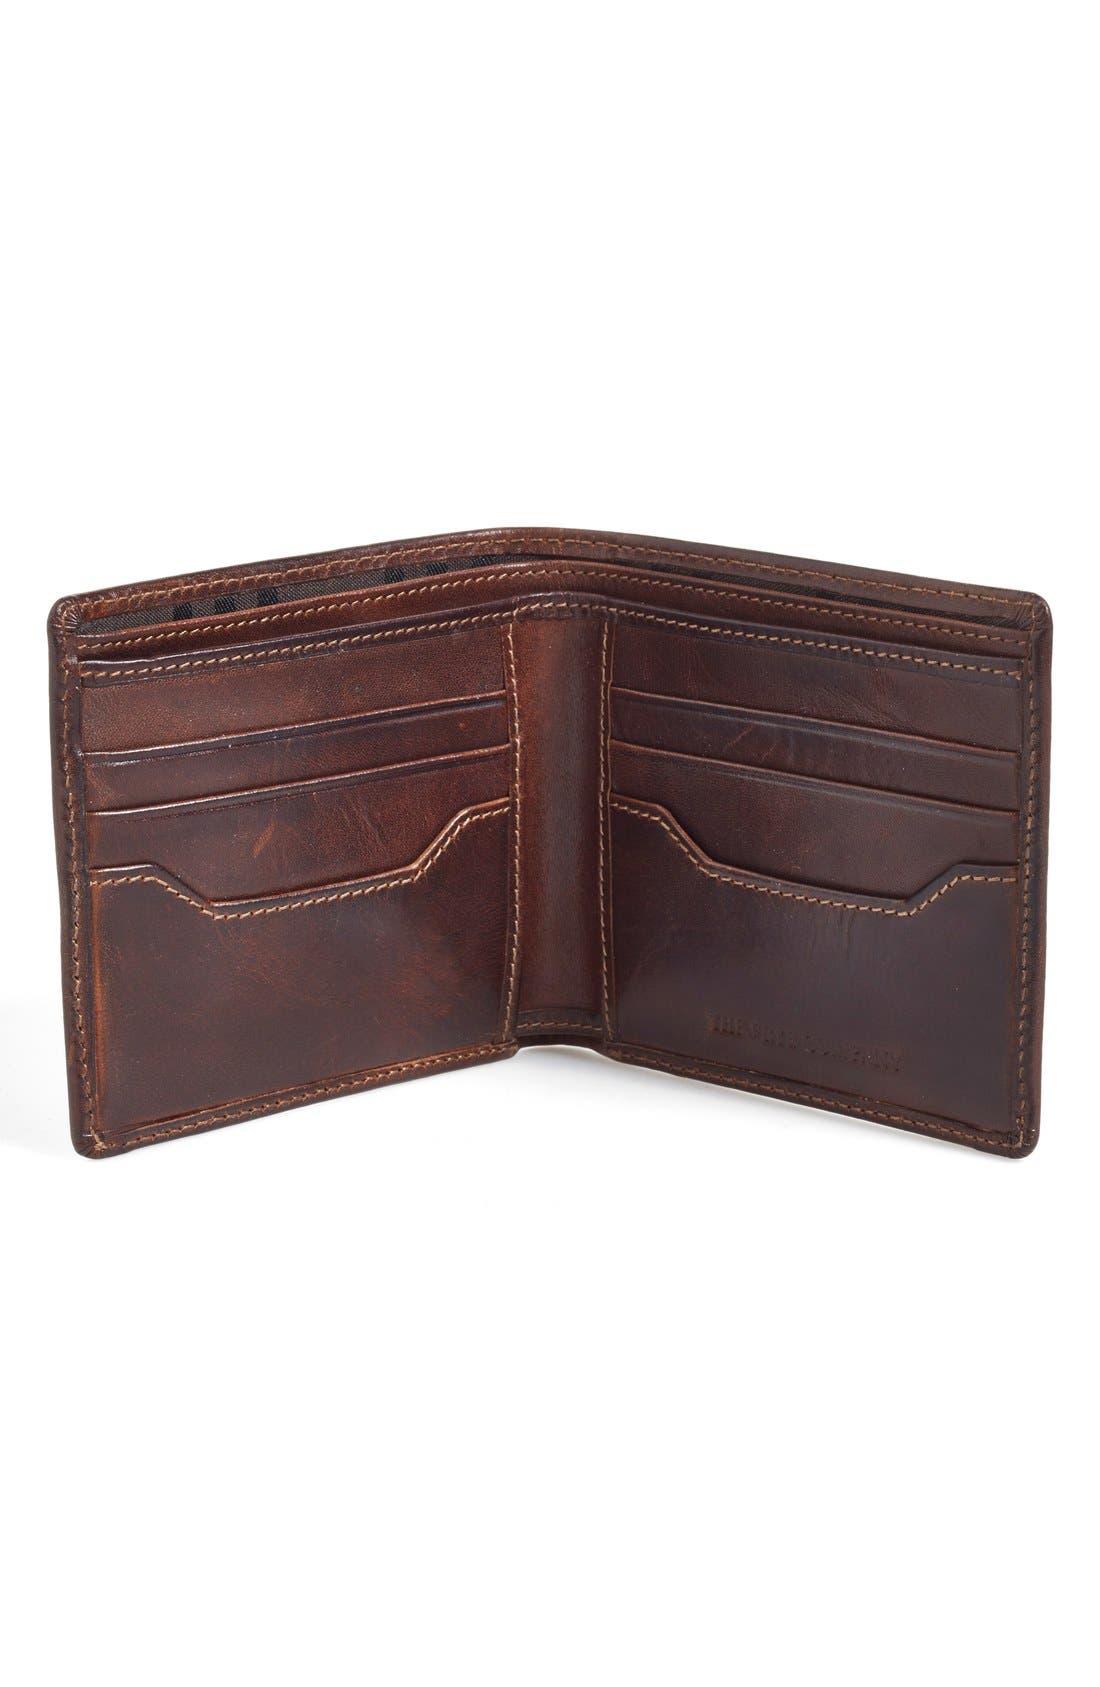 Alternate Image 2  - Frye 'Logan' Leather Billfold Wallet (Online Only)